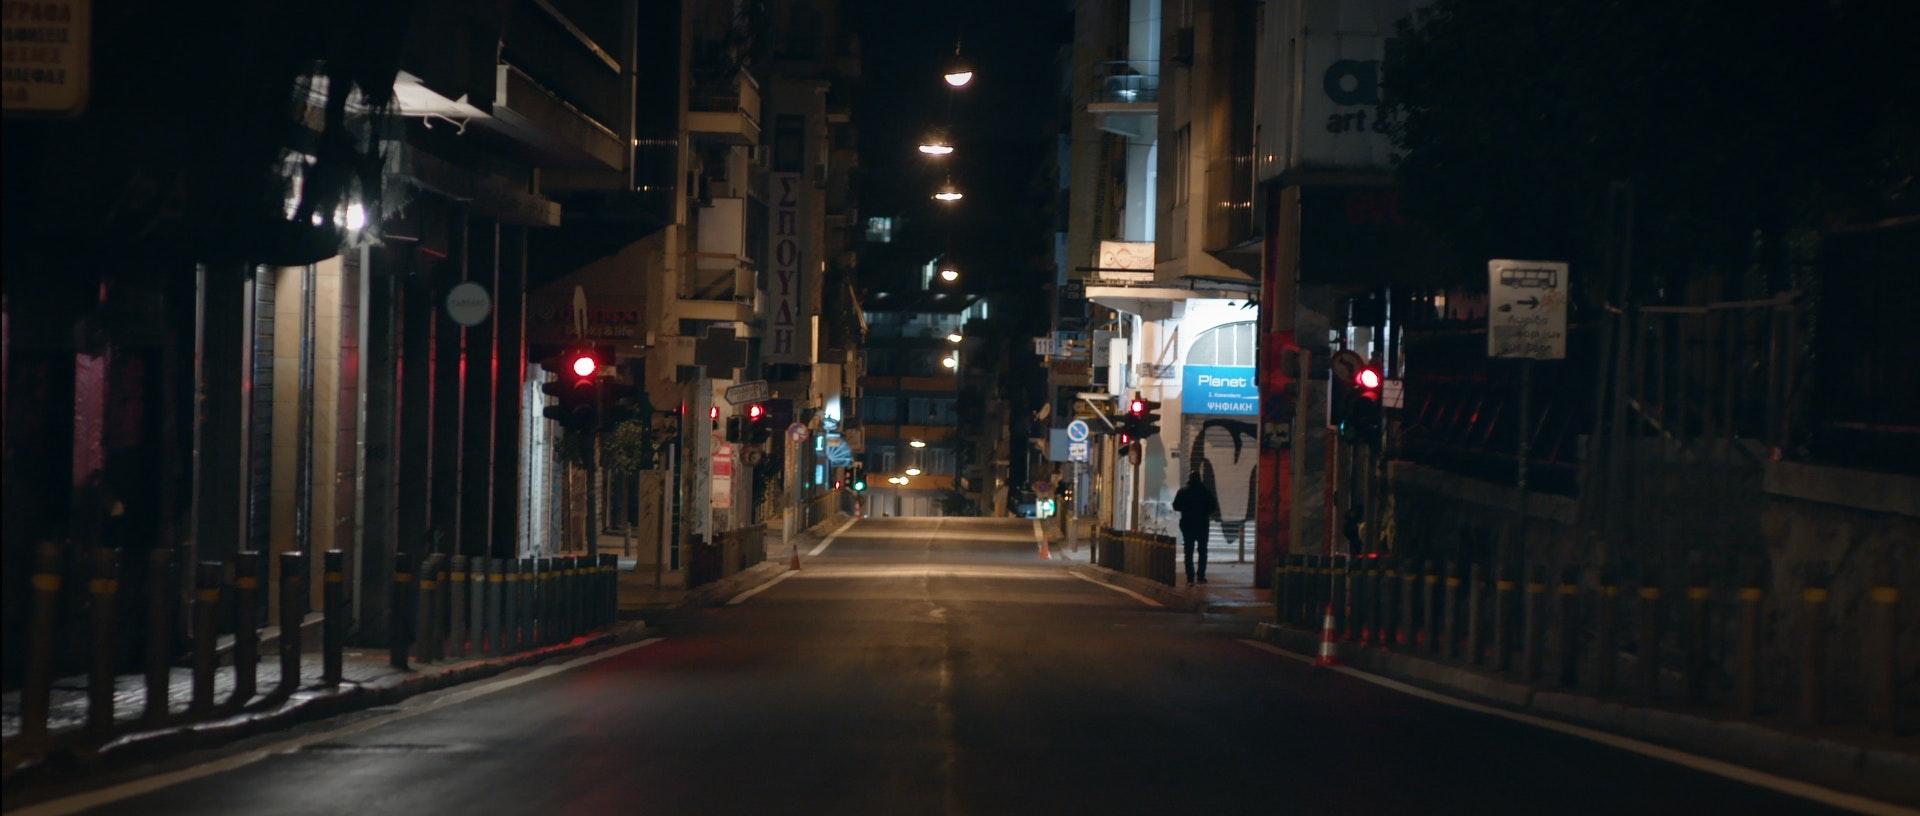 Streetwork Project still frame διεύθυνση φωτογραφίας Μιχάλης Γκατζόγιας